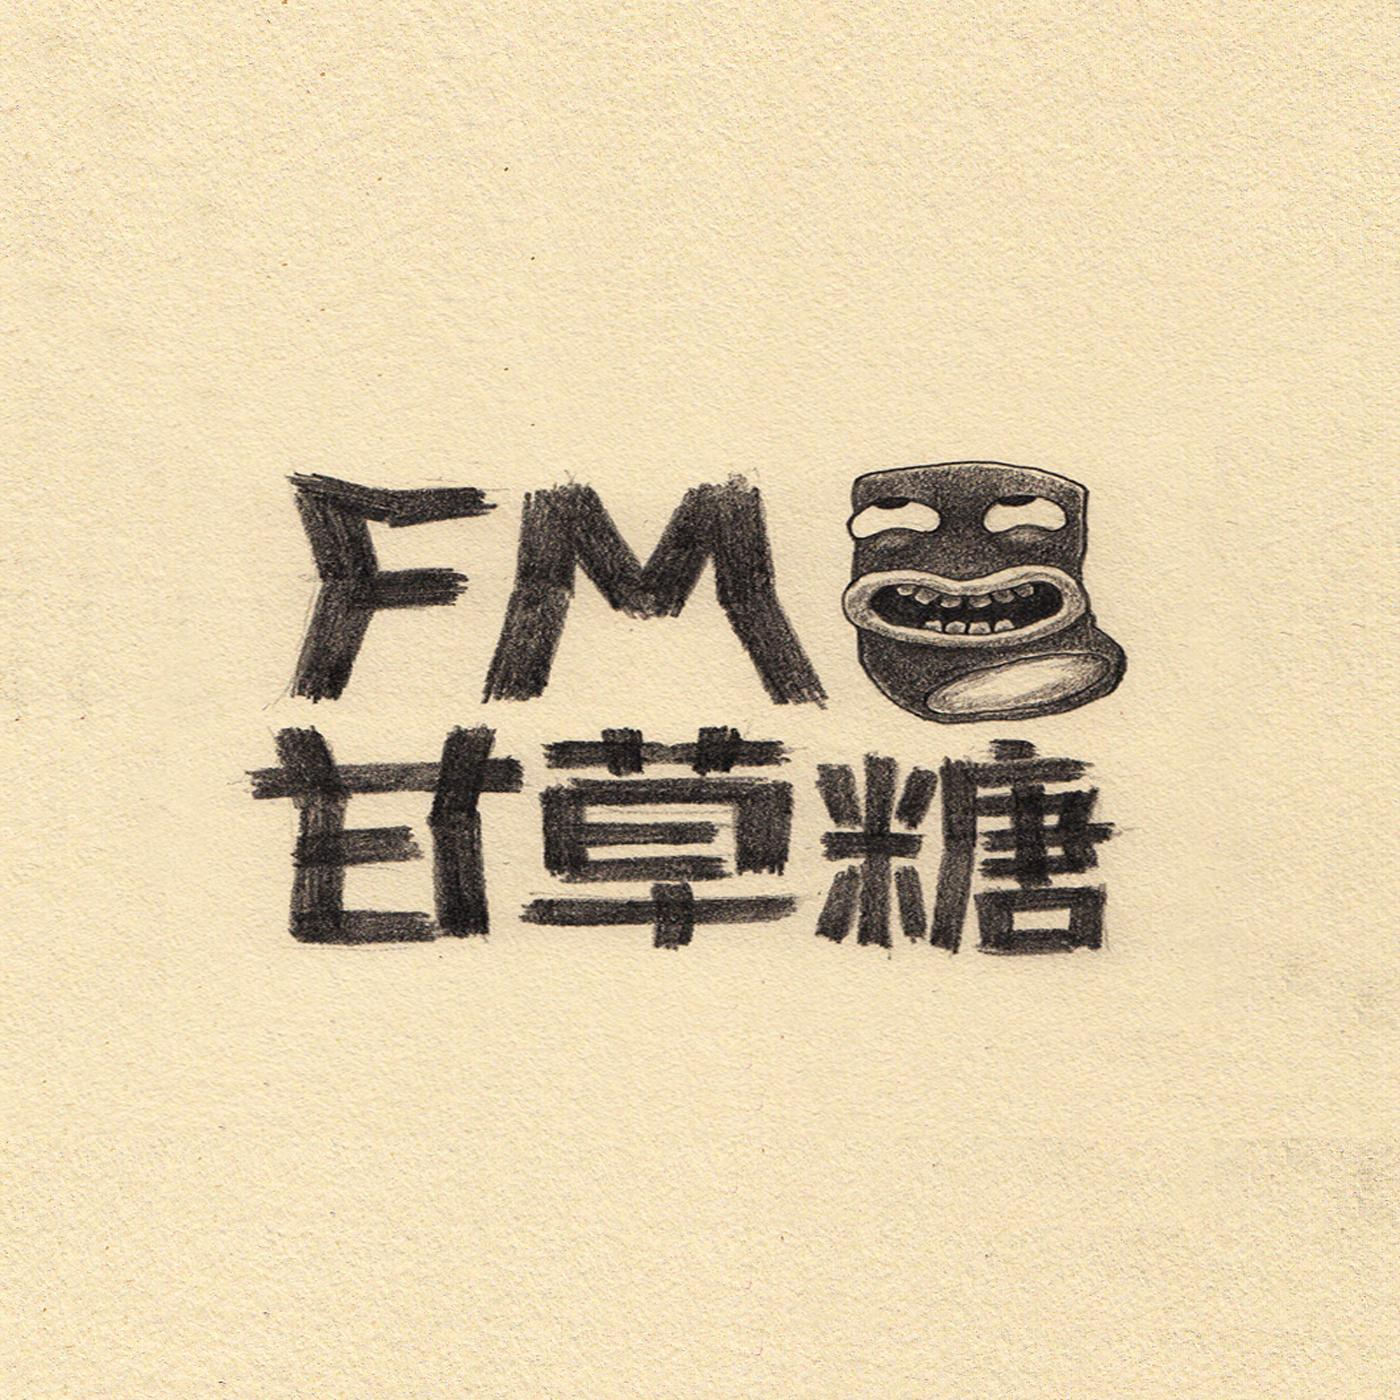 <![CDATA[德国FM甘草糖]]>